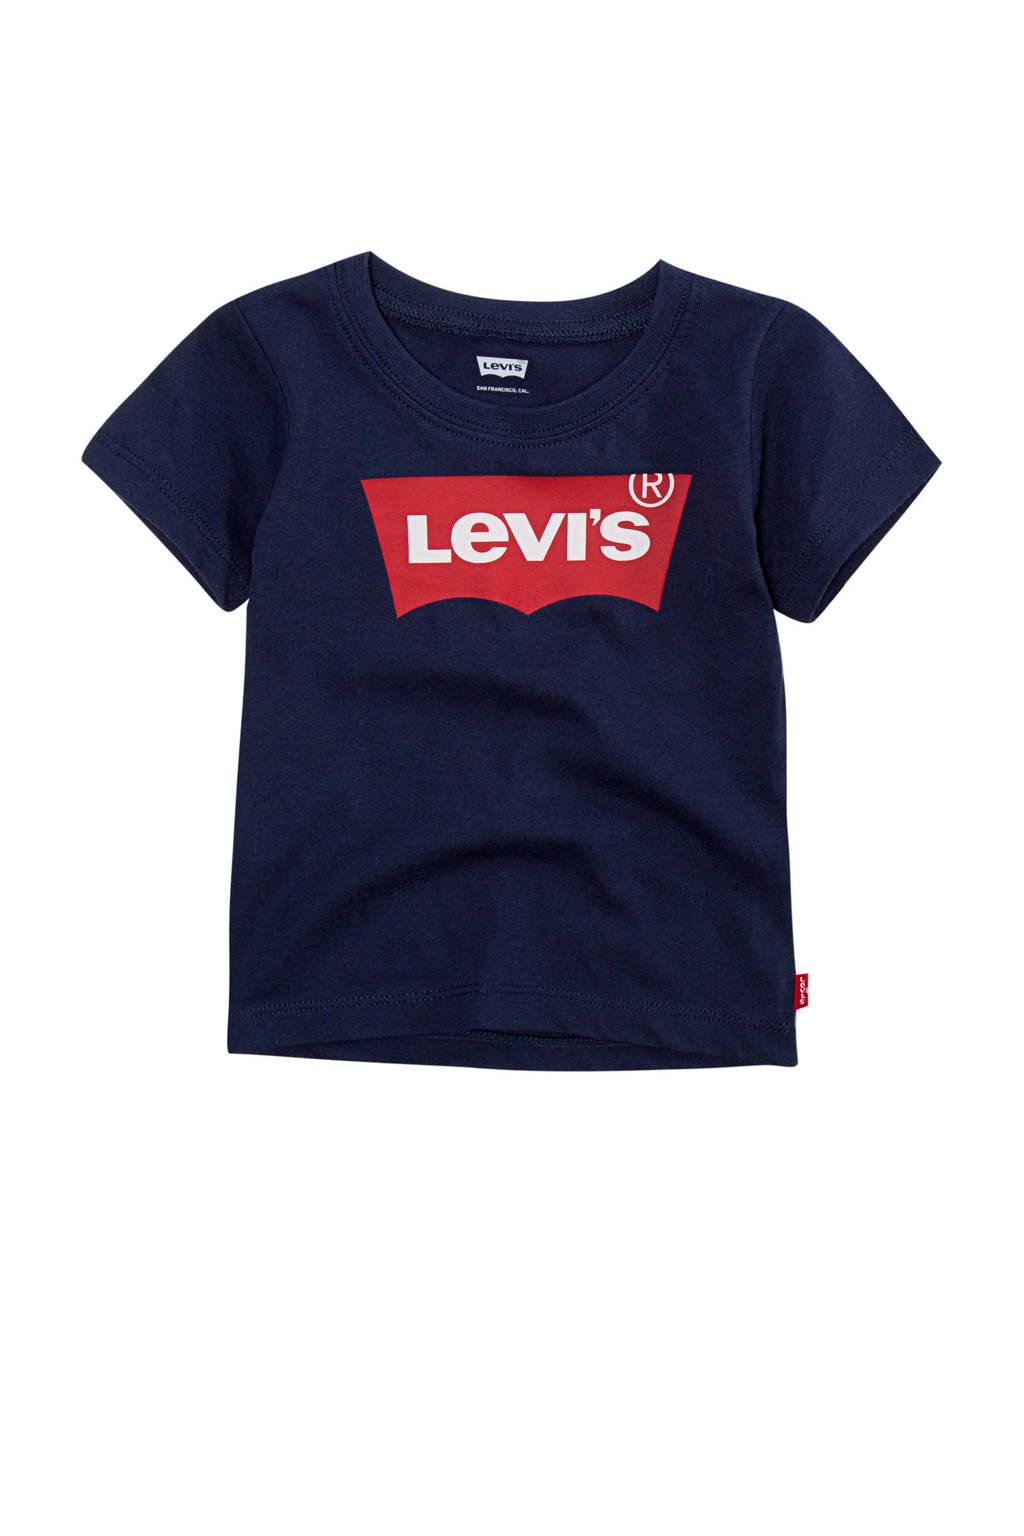 Levi's Kids T-shirt batwing met logo donkerblauw/rood, Donkerblauw/rood